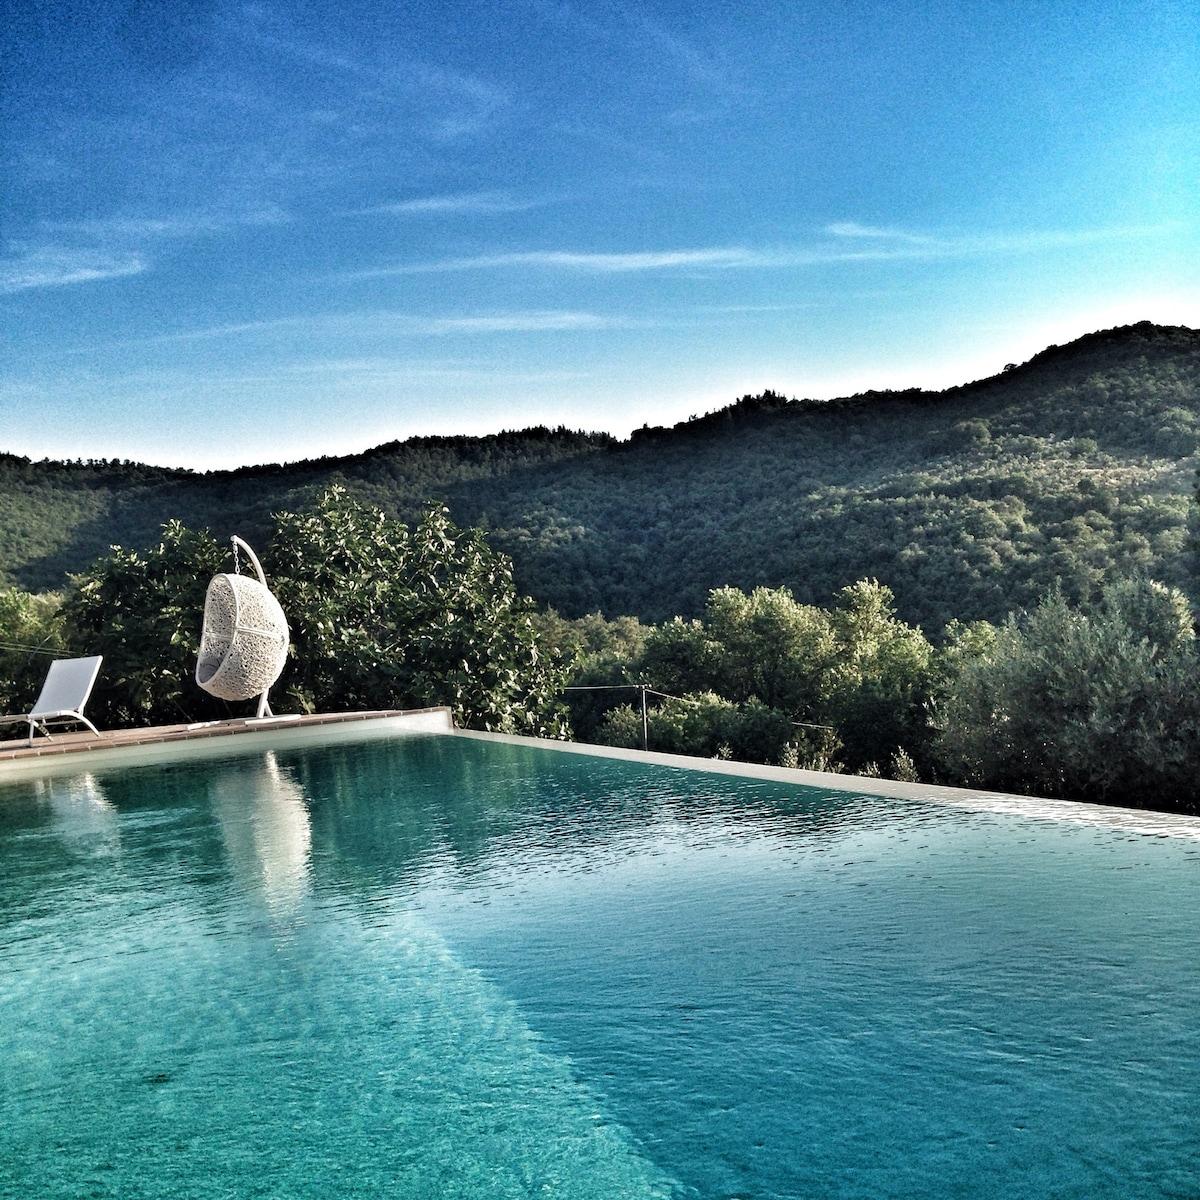 18 Century villa with pool